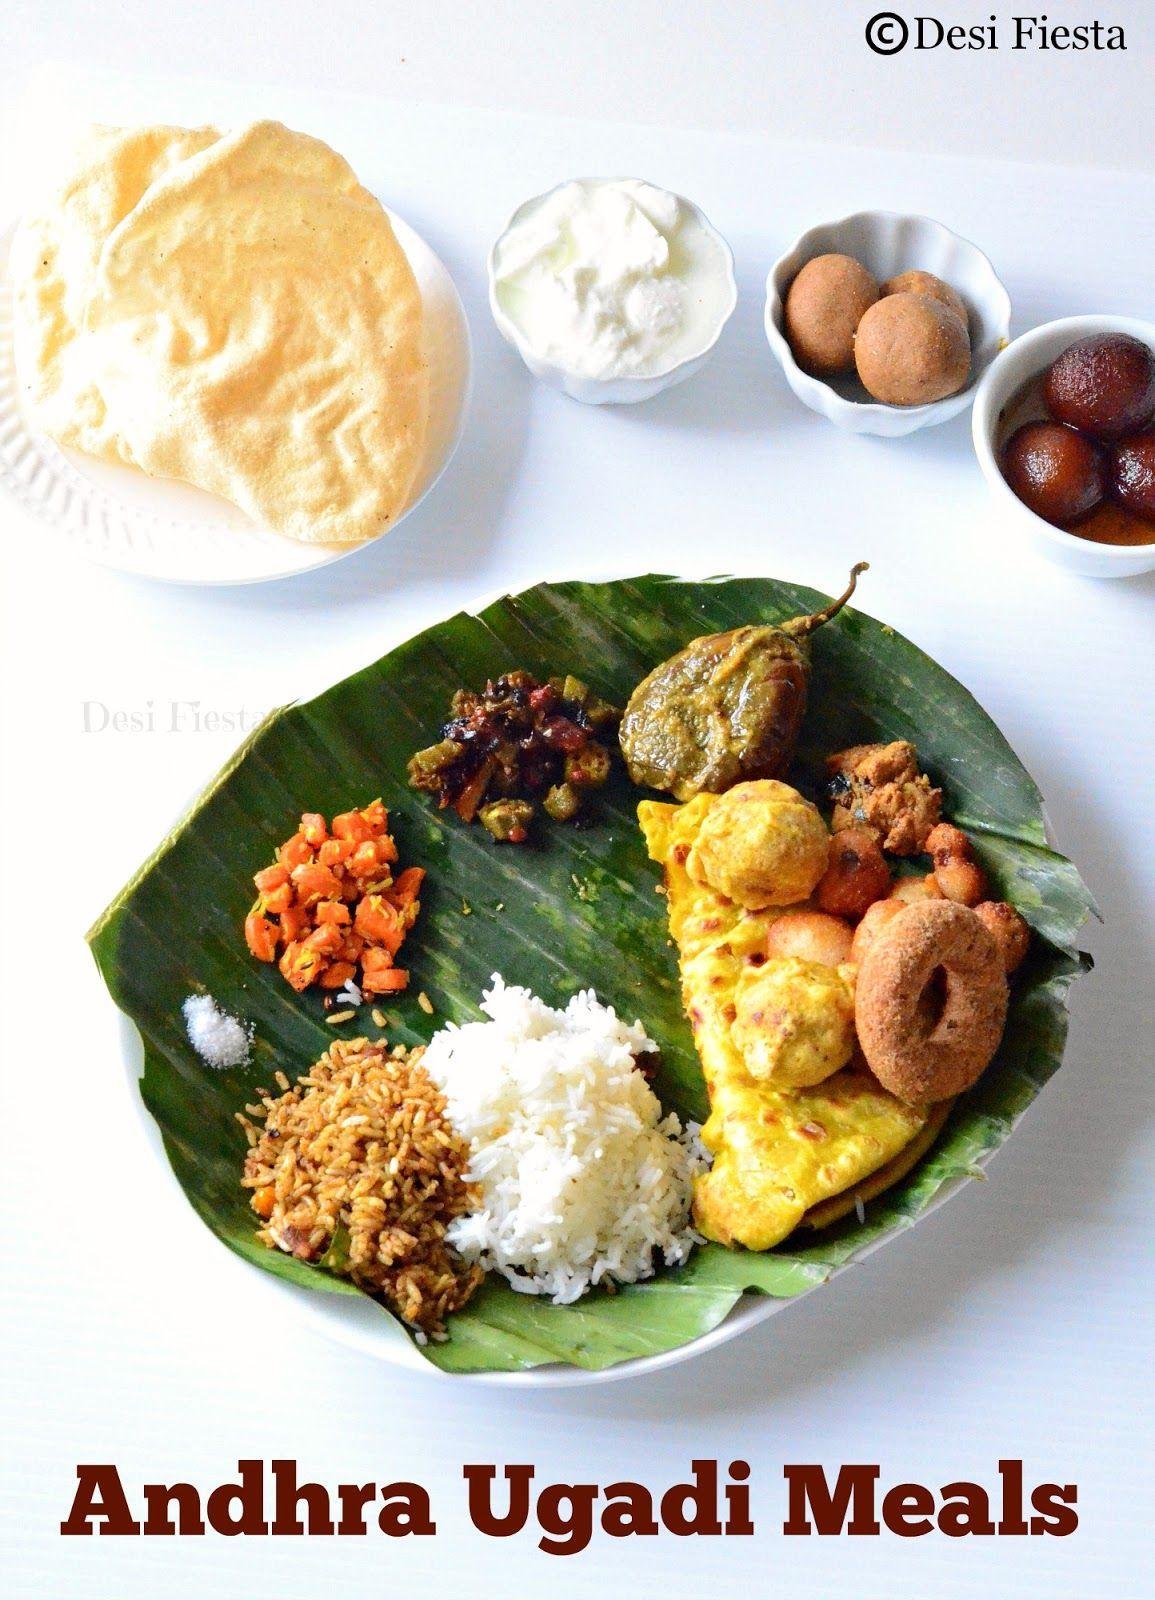 Desi fiesta andhra pradesh ugadi meals adhra pradesh thali desi fiesta andhra pradesh ugadi meals adhra pradesh thali veg recipesbaking forumfinder Image collections